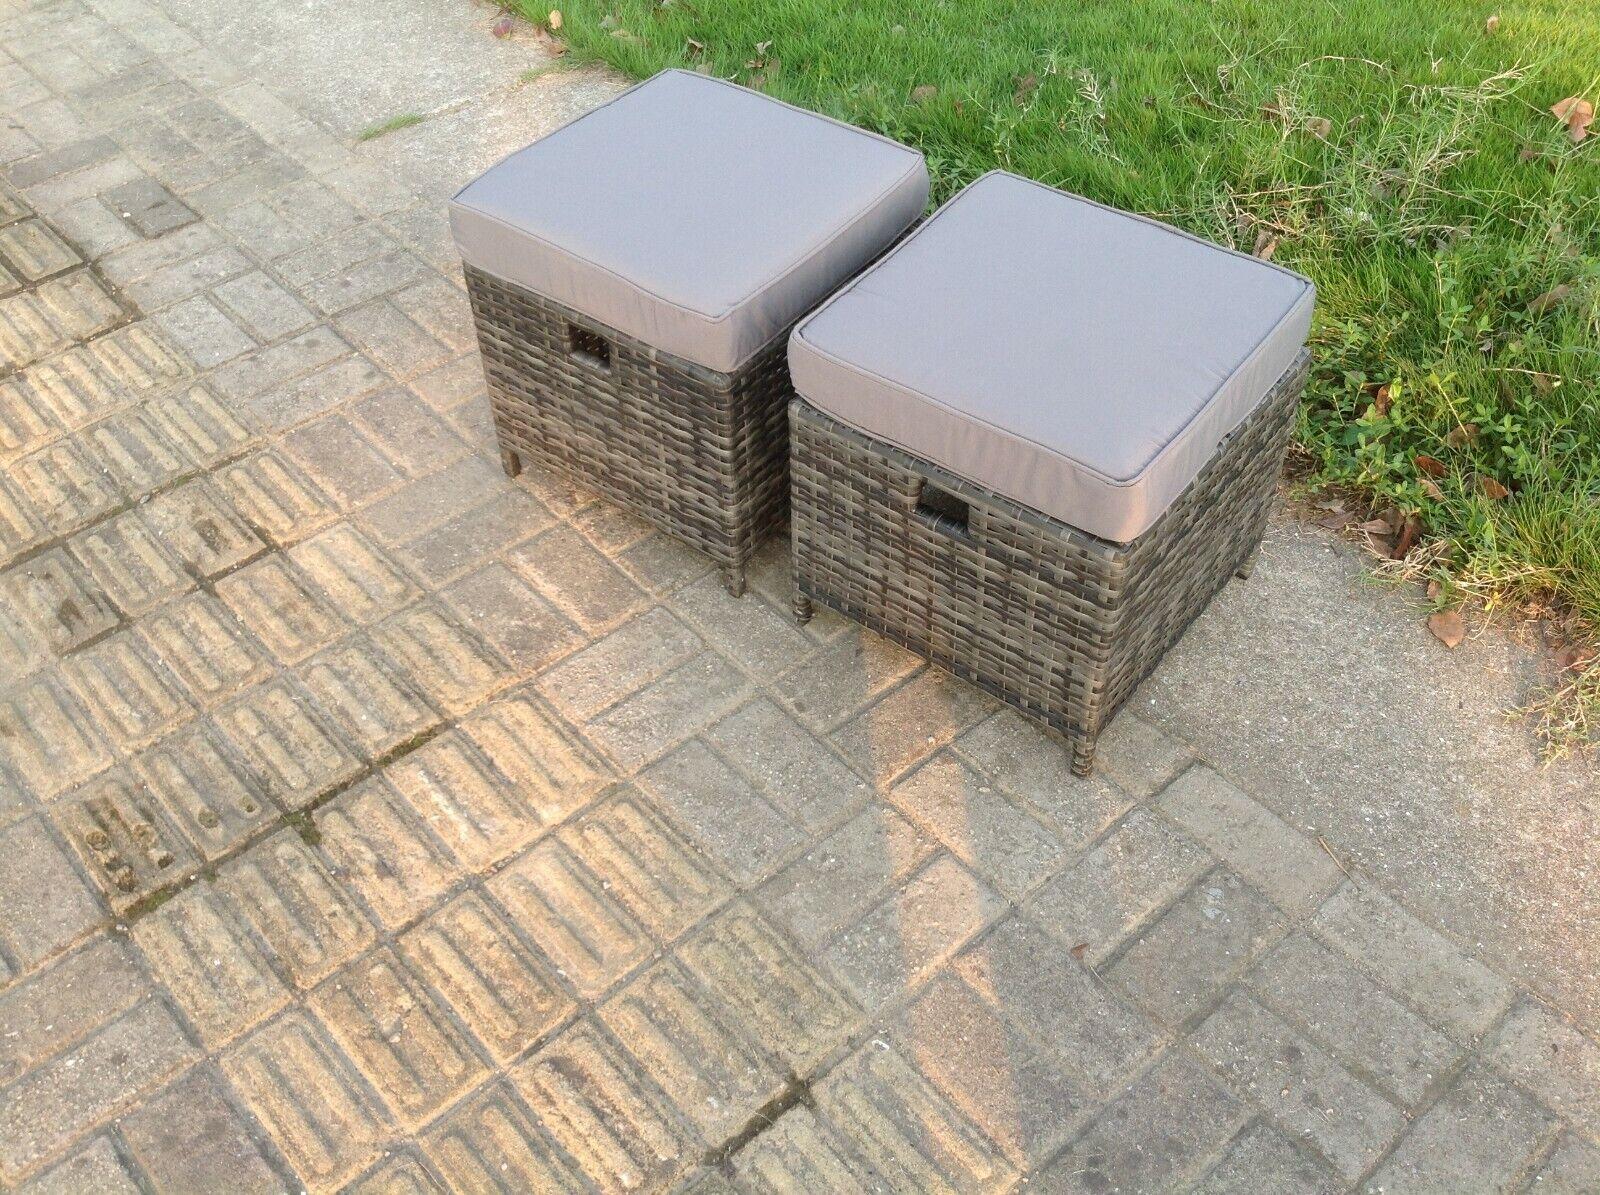 Garden Furniture - 2 PCS Small Rattan Footstool With Cushion Grey Patio Garden Furniture